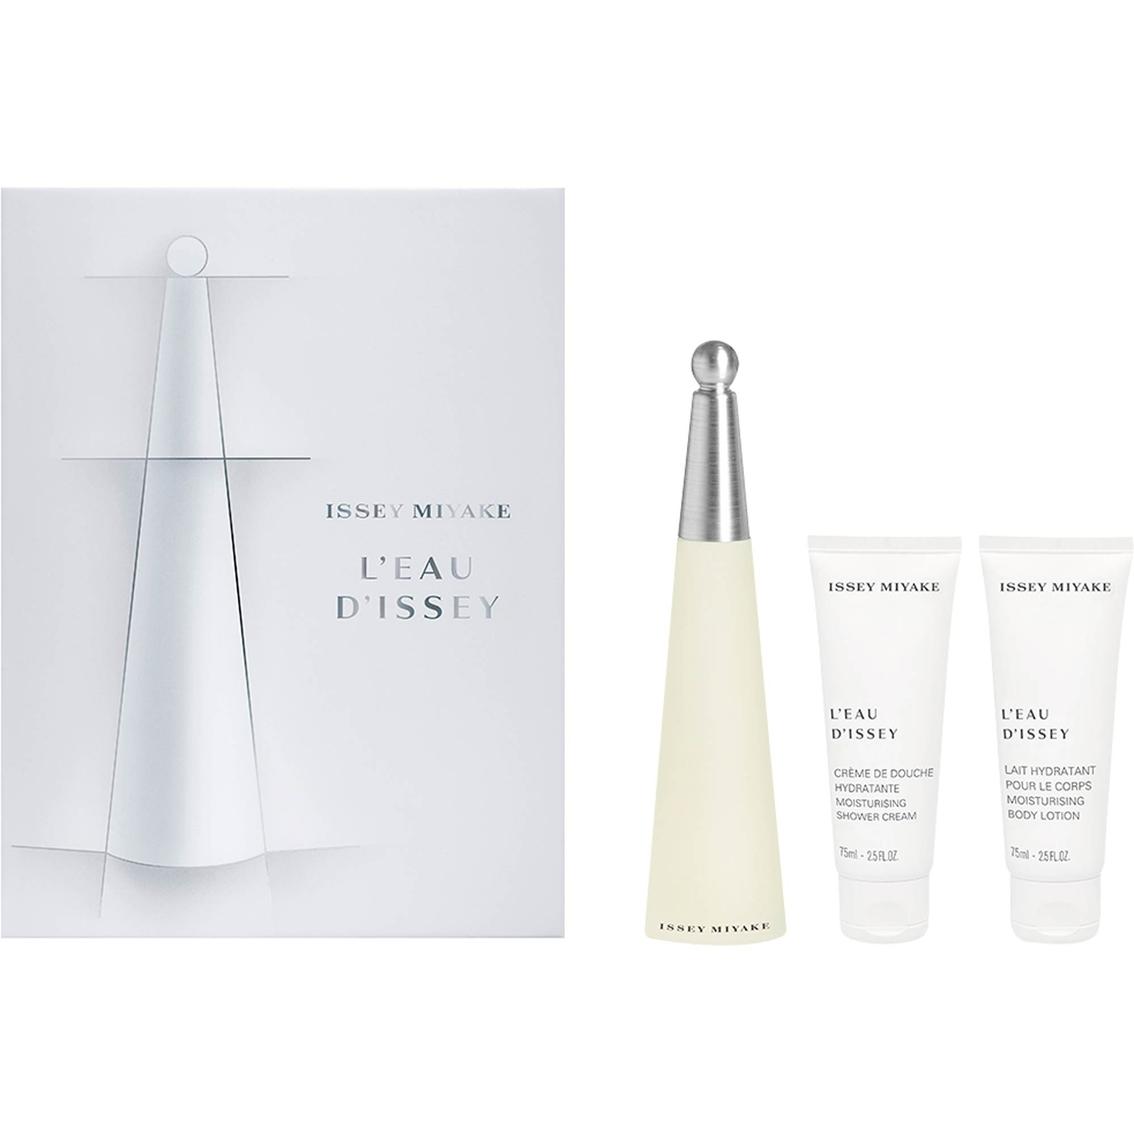 essay miyake perfume